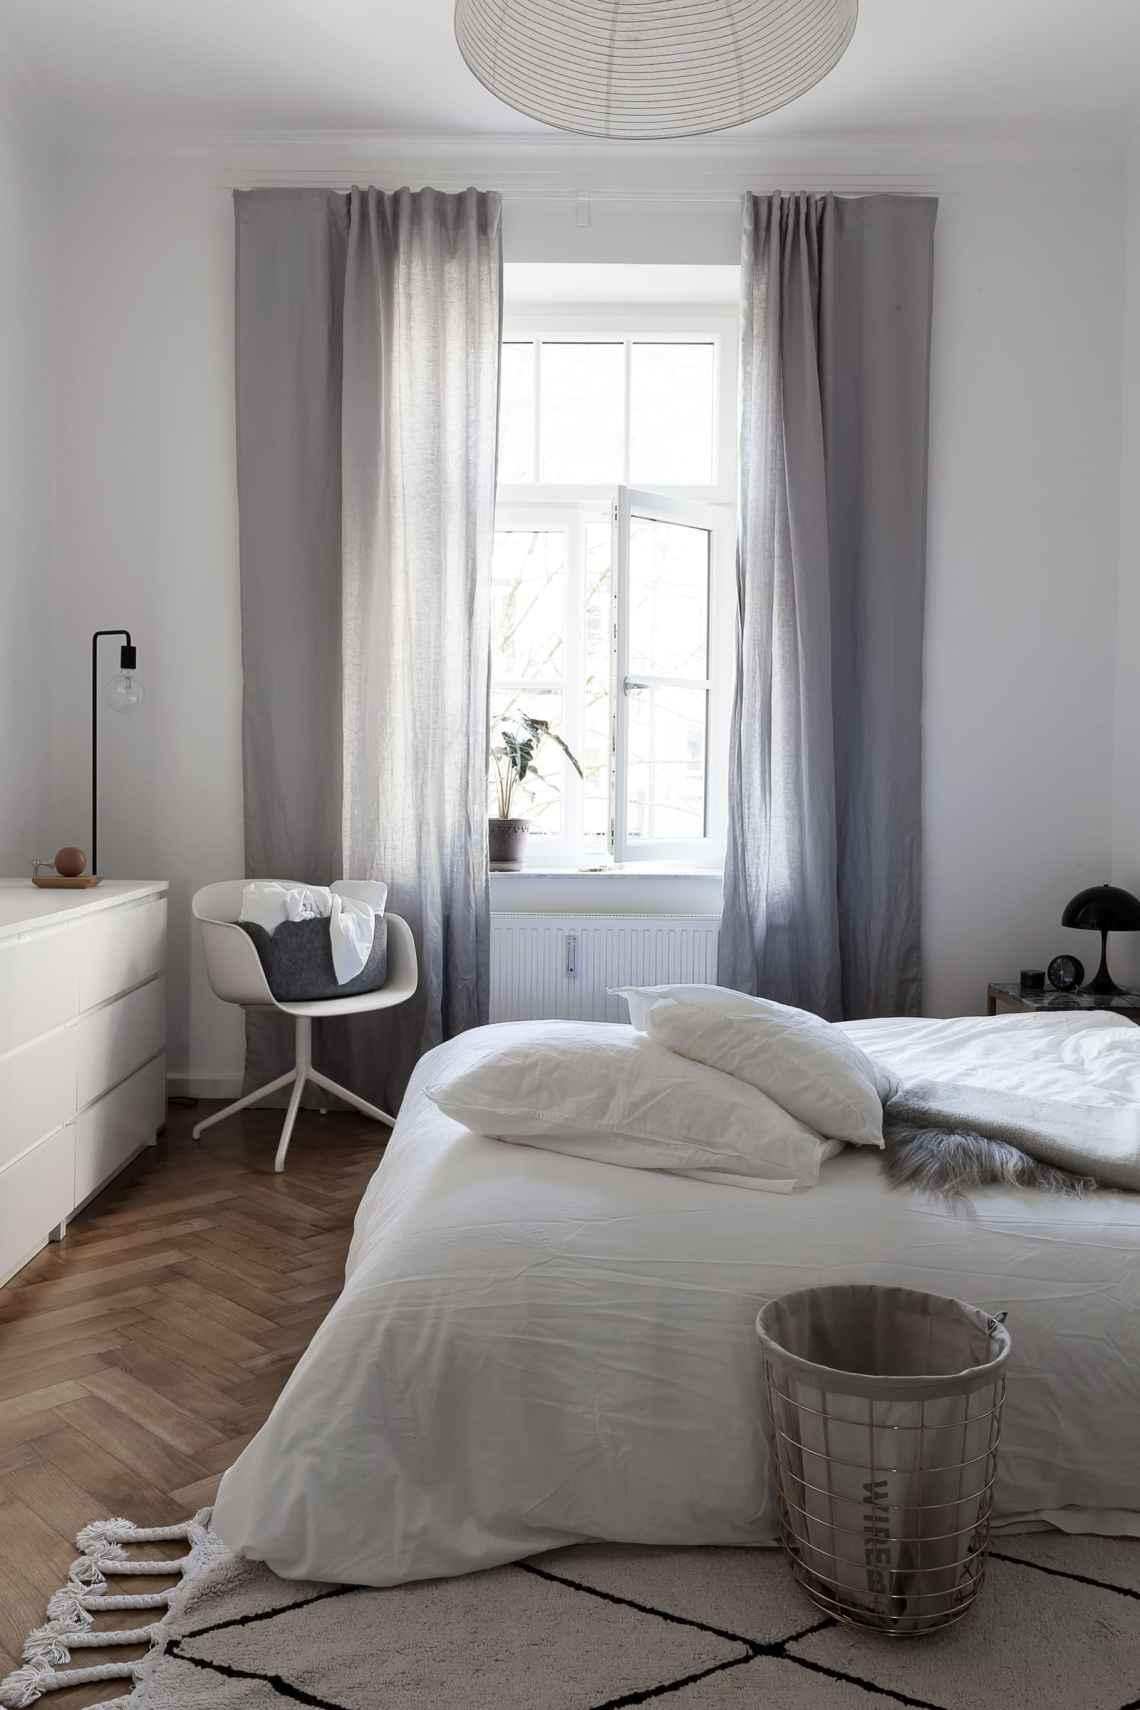 Our bedroom - via Coco Lapine Design blog